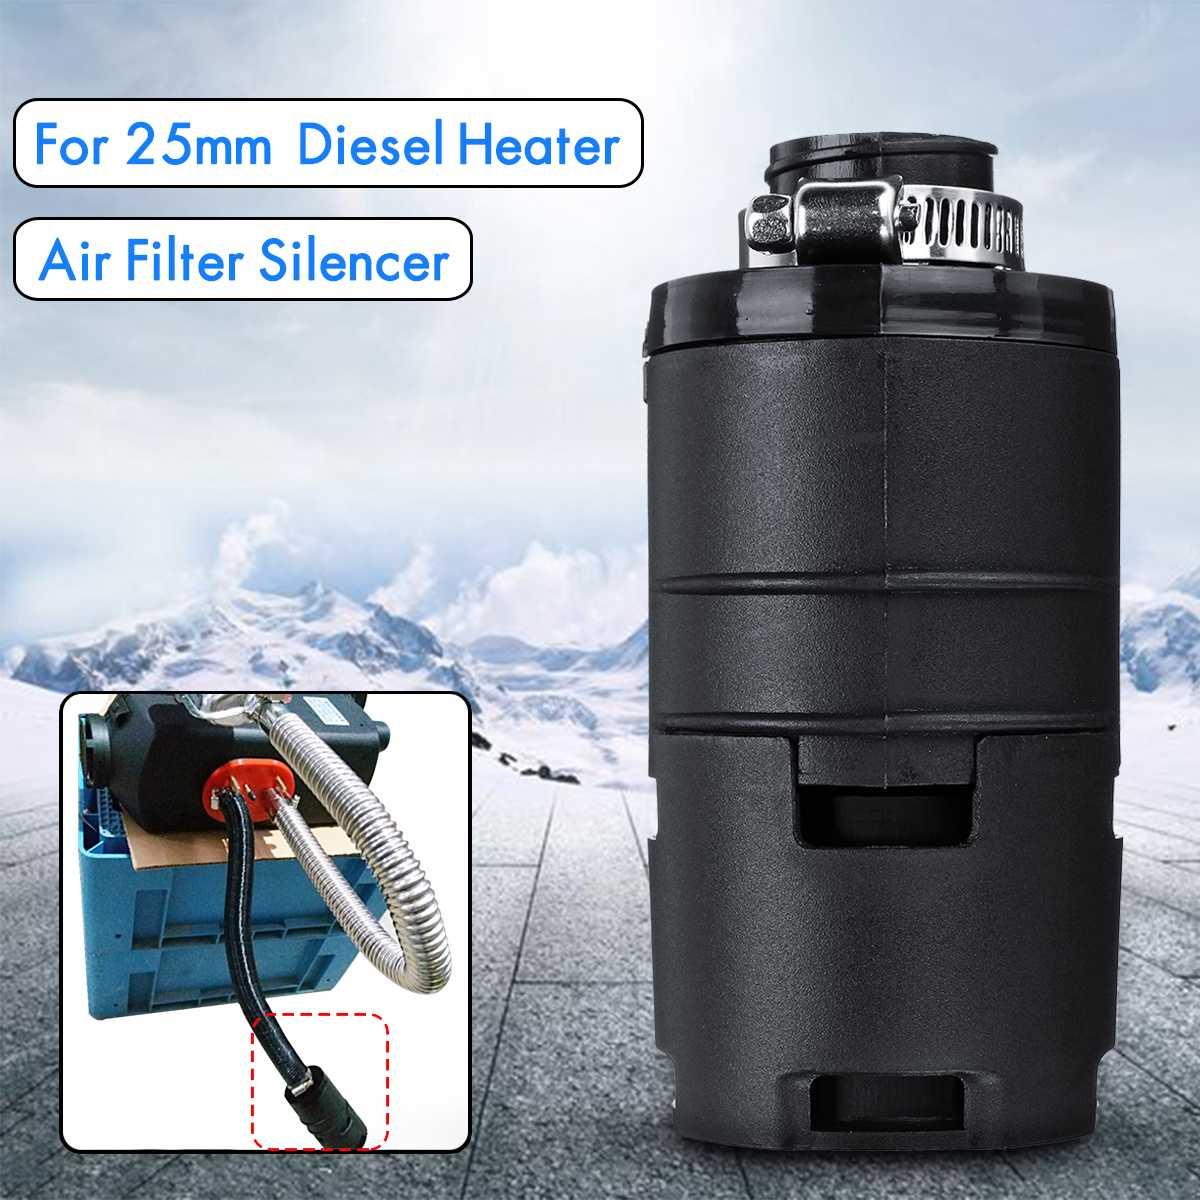 25mm Air Intake Filter Silencer For Dometic Eberspacher Webasto Diesel Heater